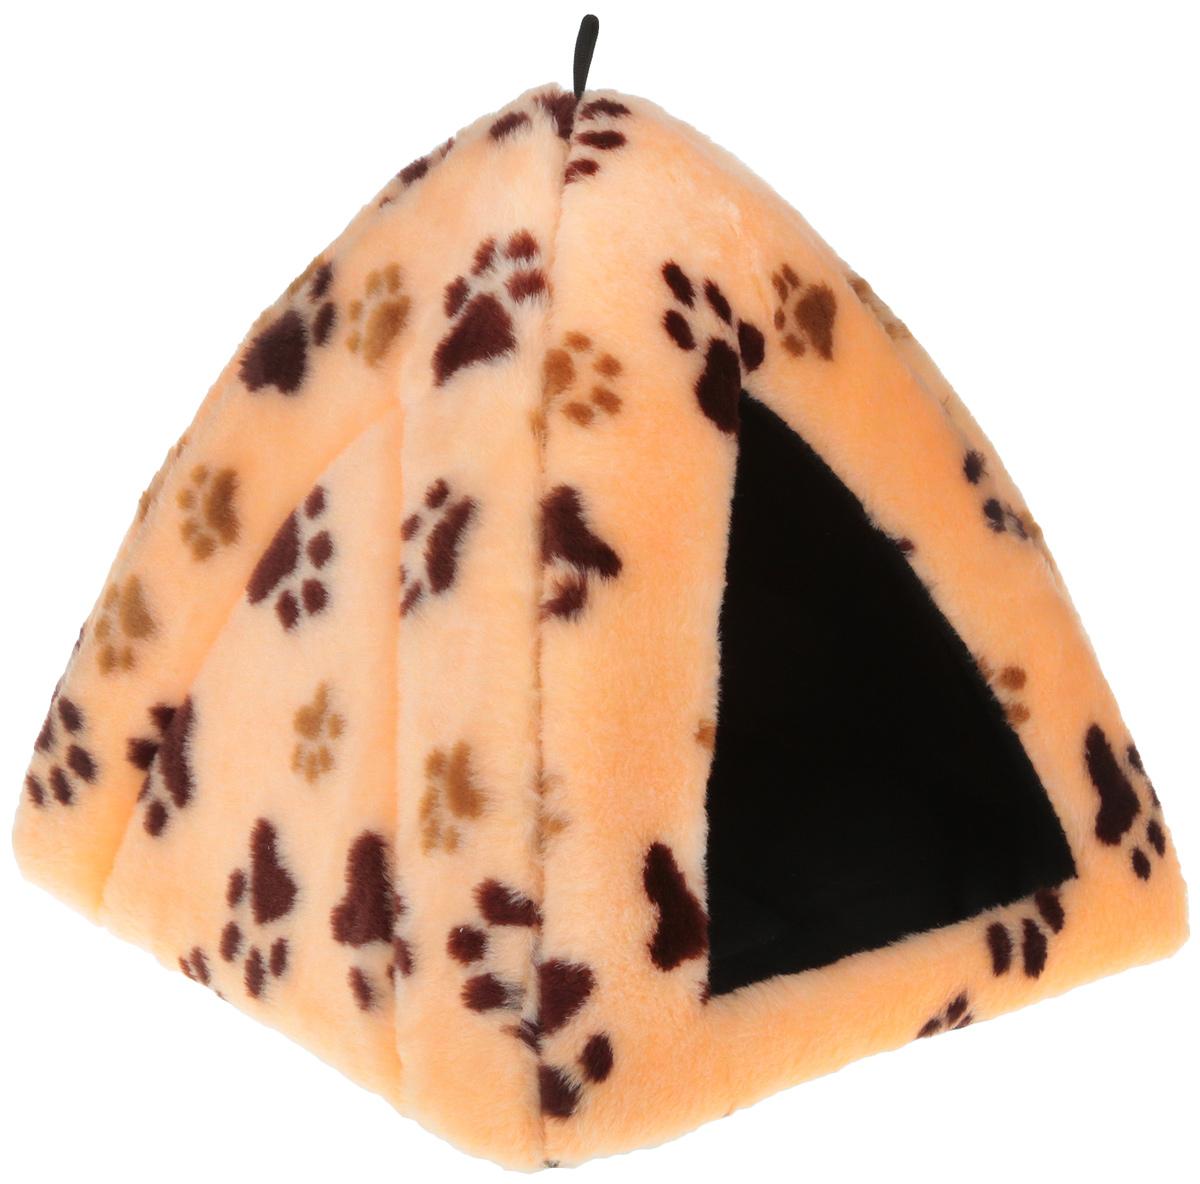 Лежак закрытый Elite Valley Вигвам, цвет: бежевый, коричневый, черный, 40 х 40 х 37 см. Л-22/2 лежак дарэлл хантер лось 2 с подушкой 55 40 16см